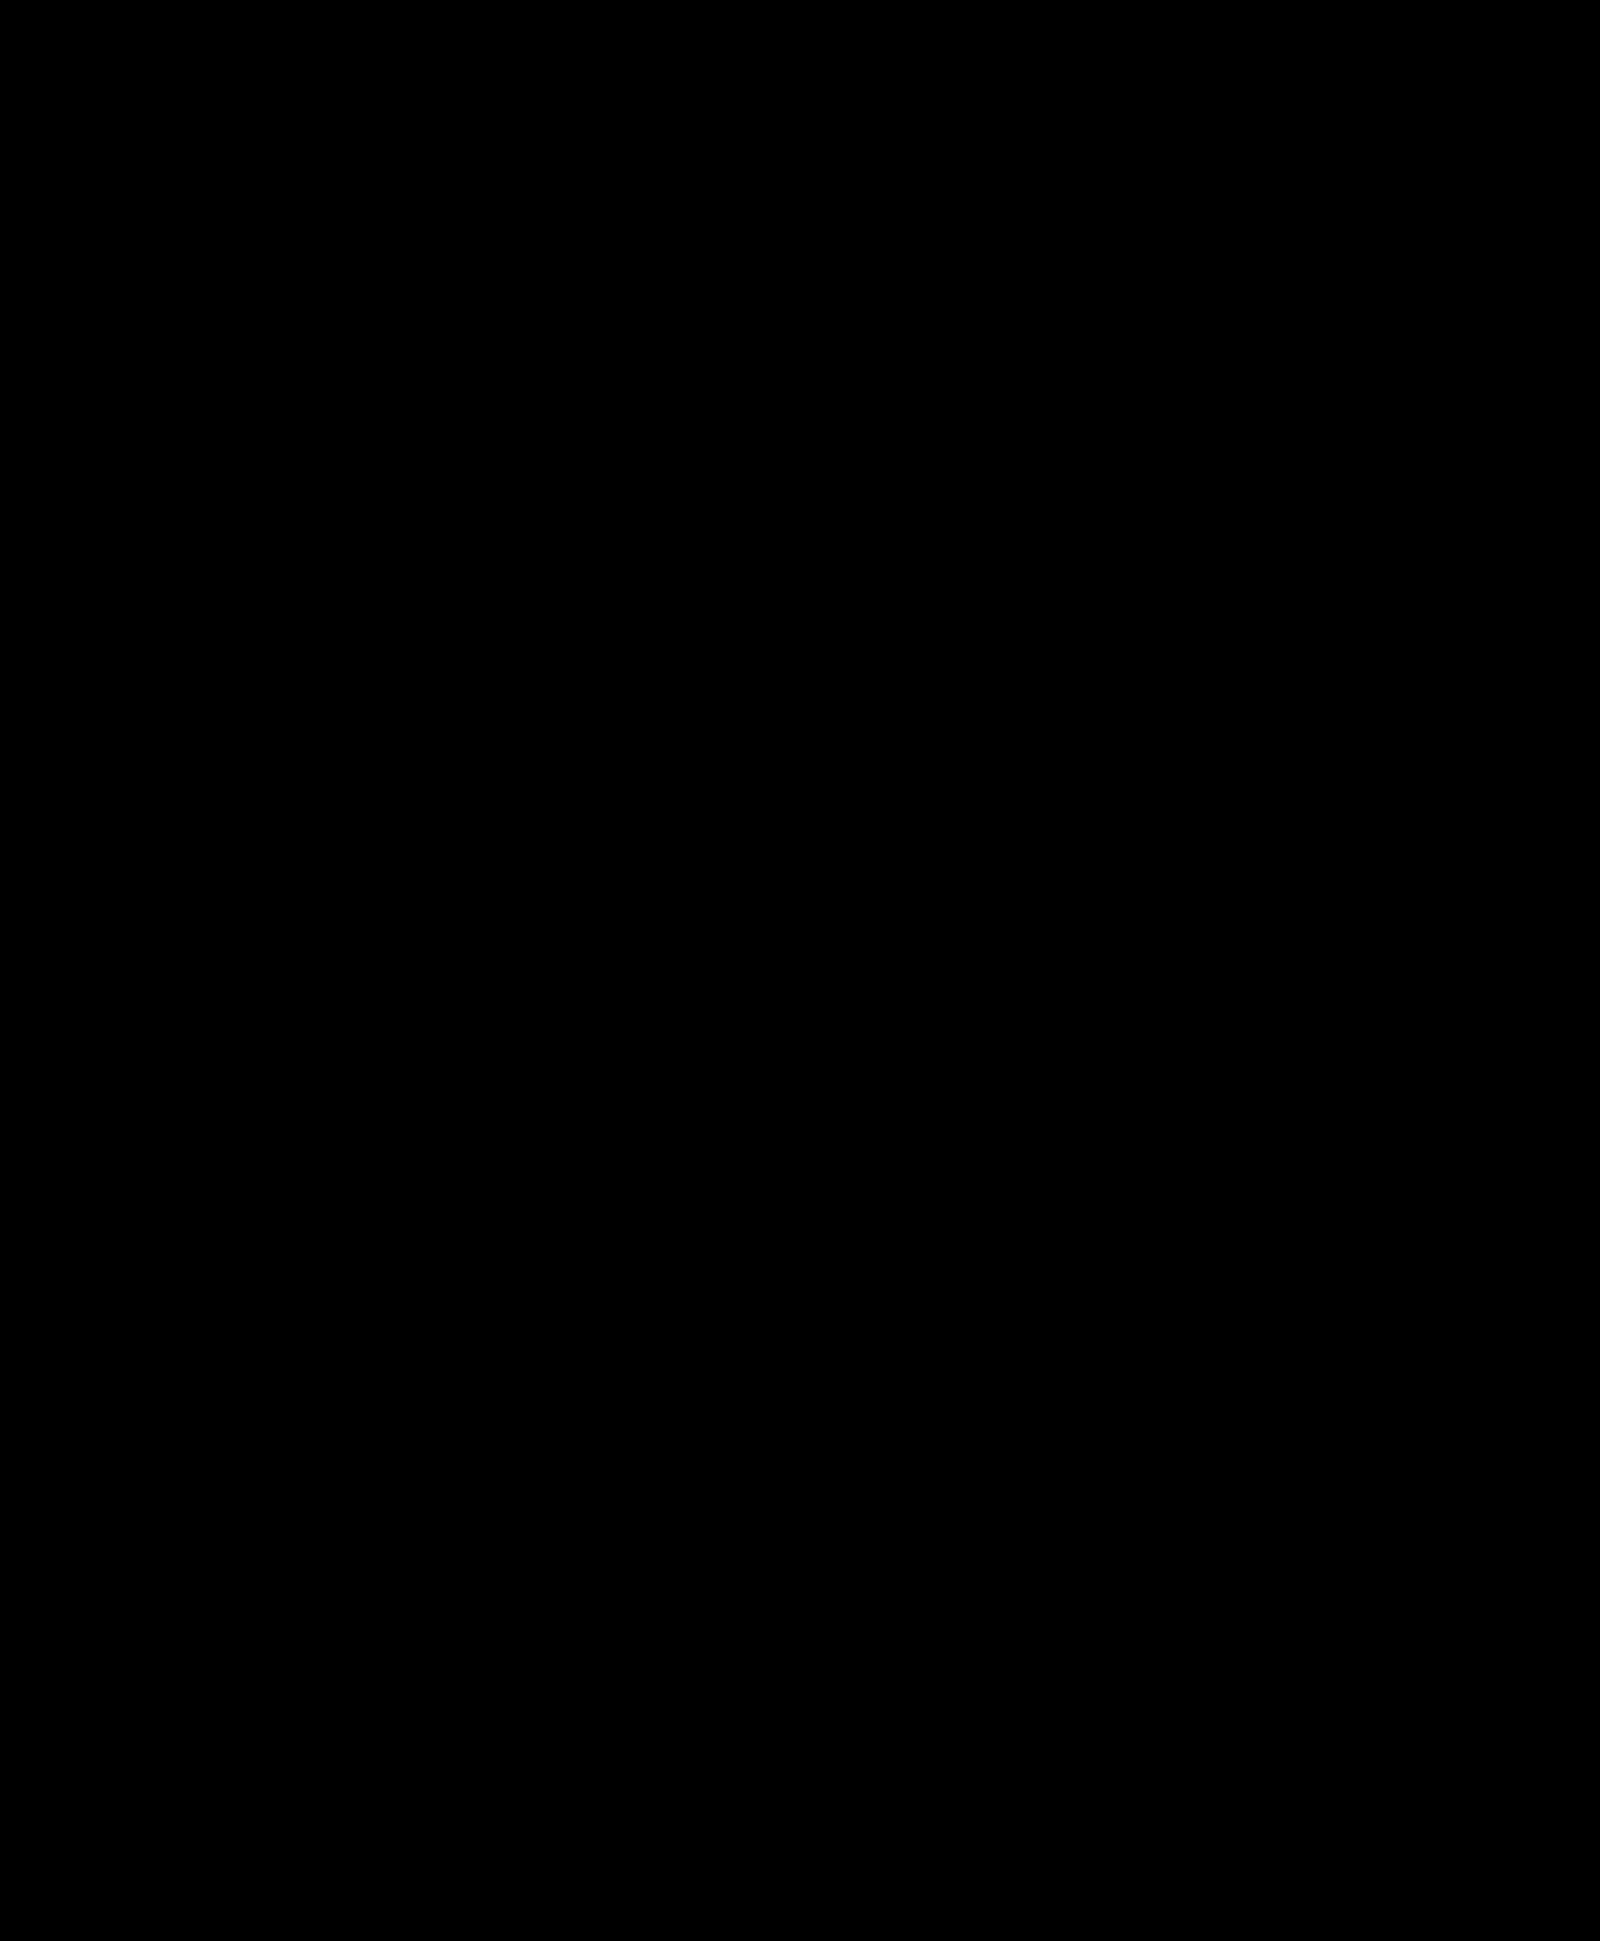 Ellipse SVG Clip arts